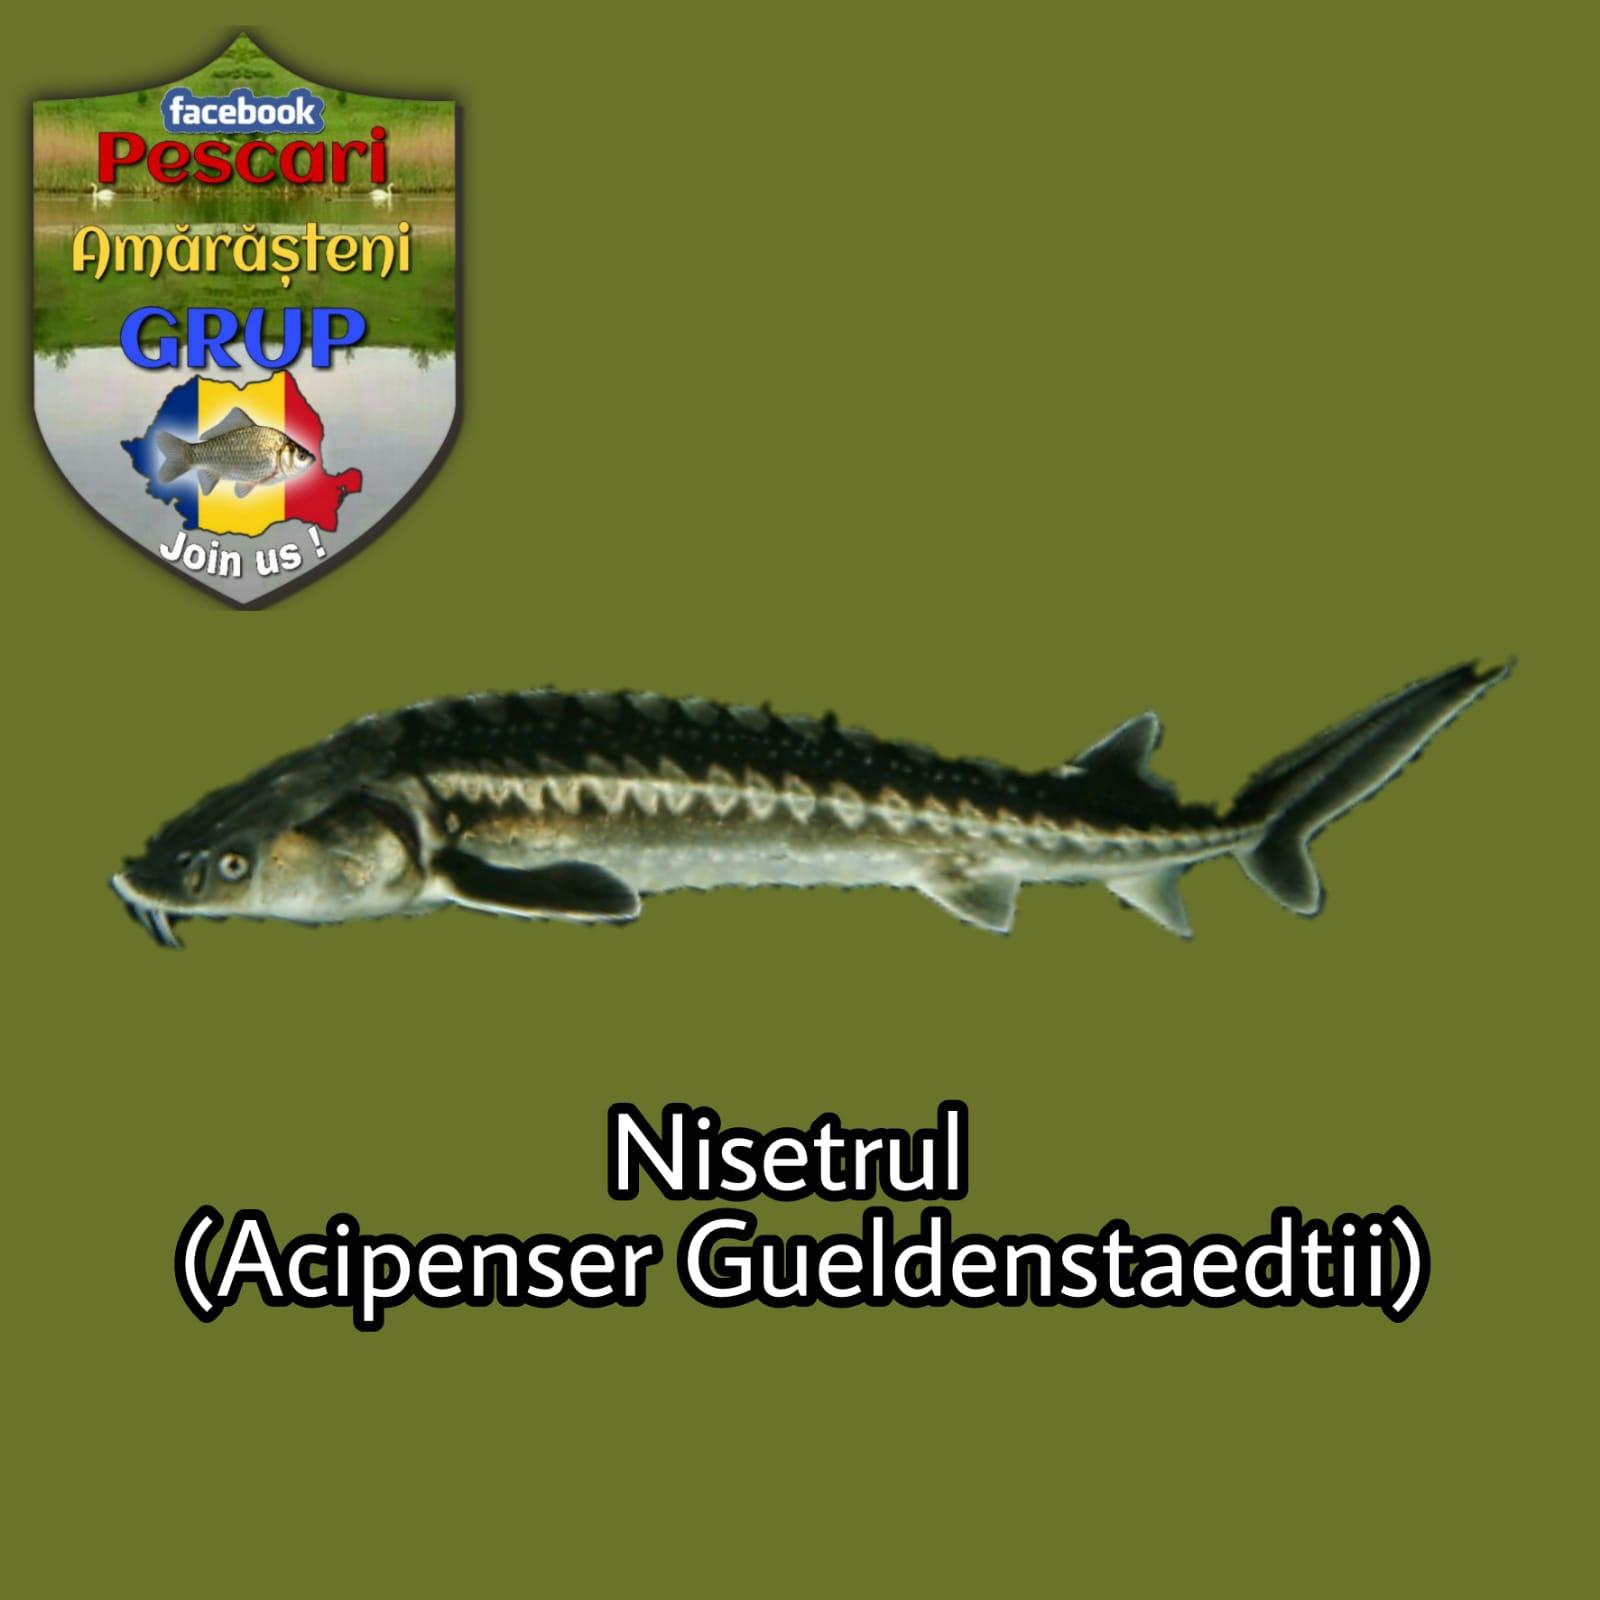 Nisetrul (Acipenser gueldenstaedtii)